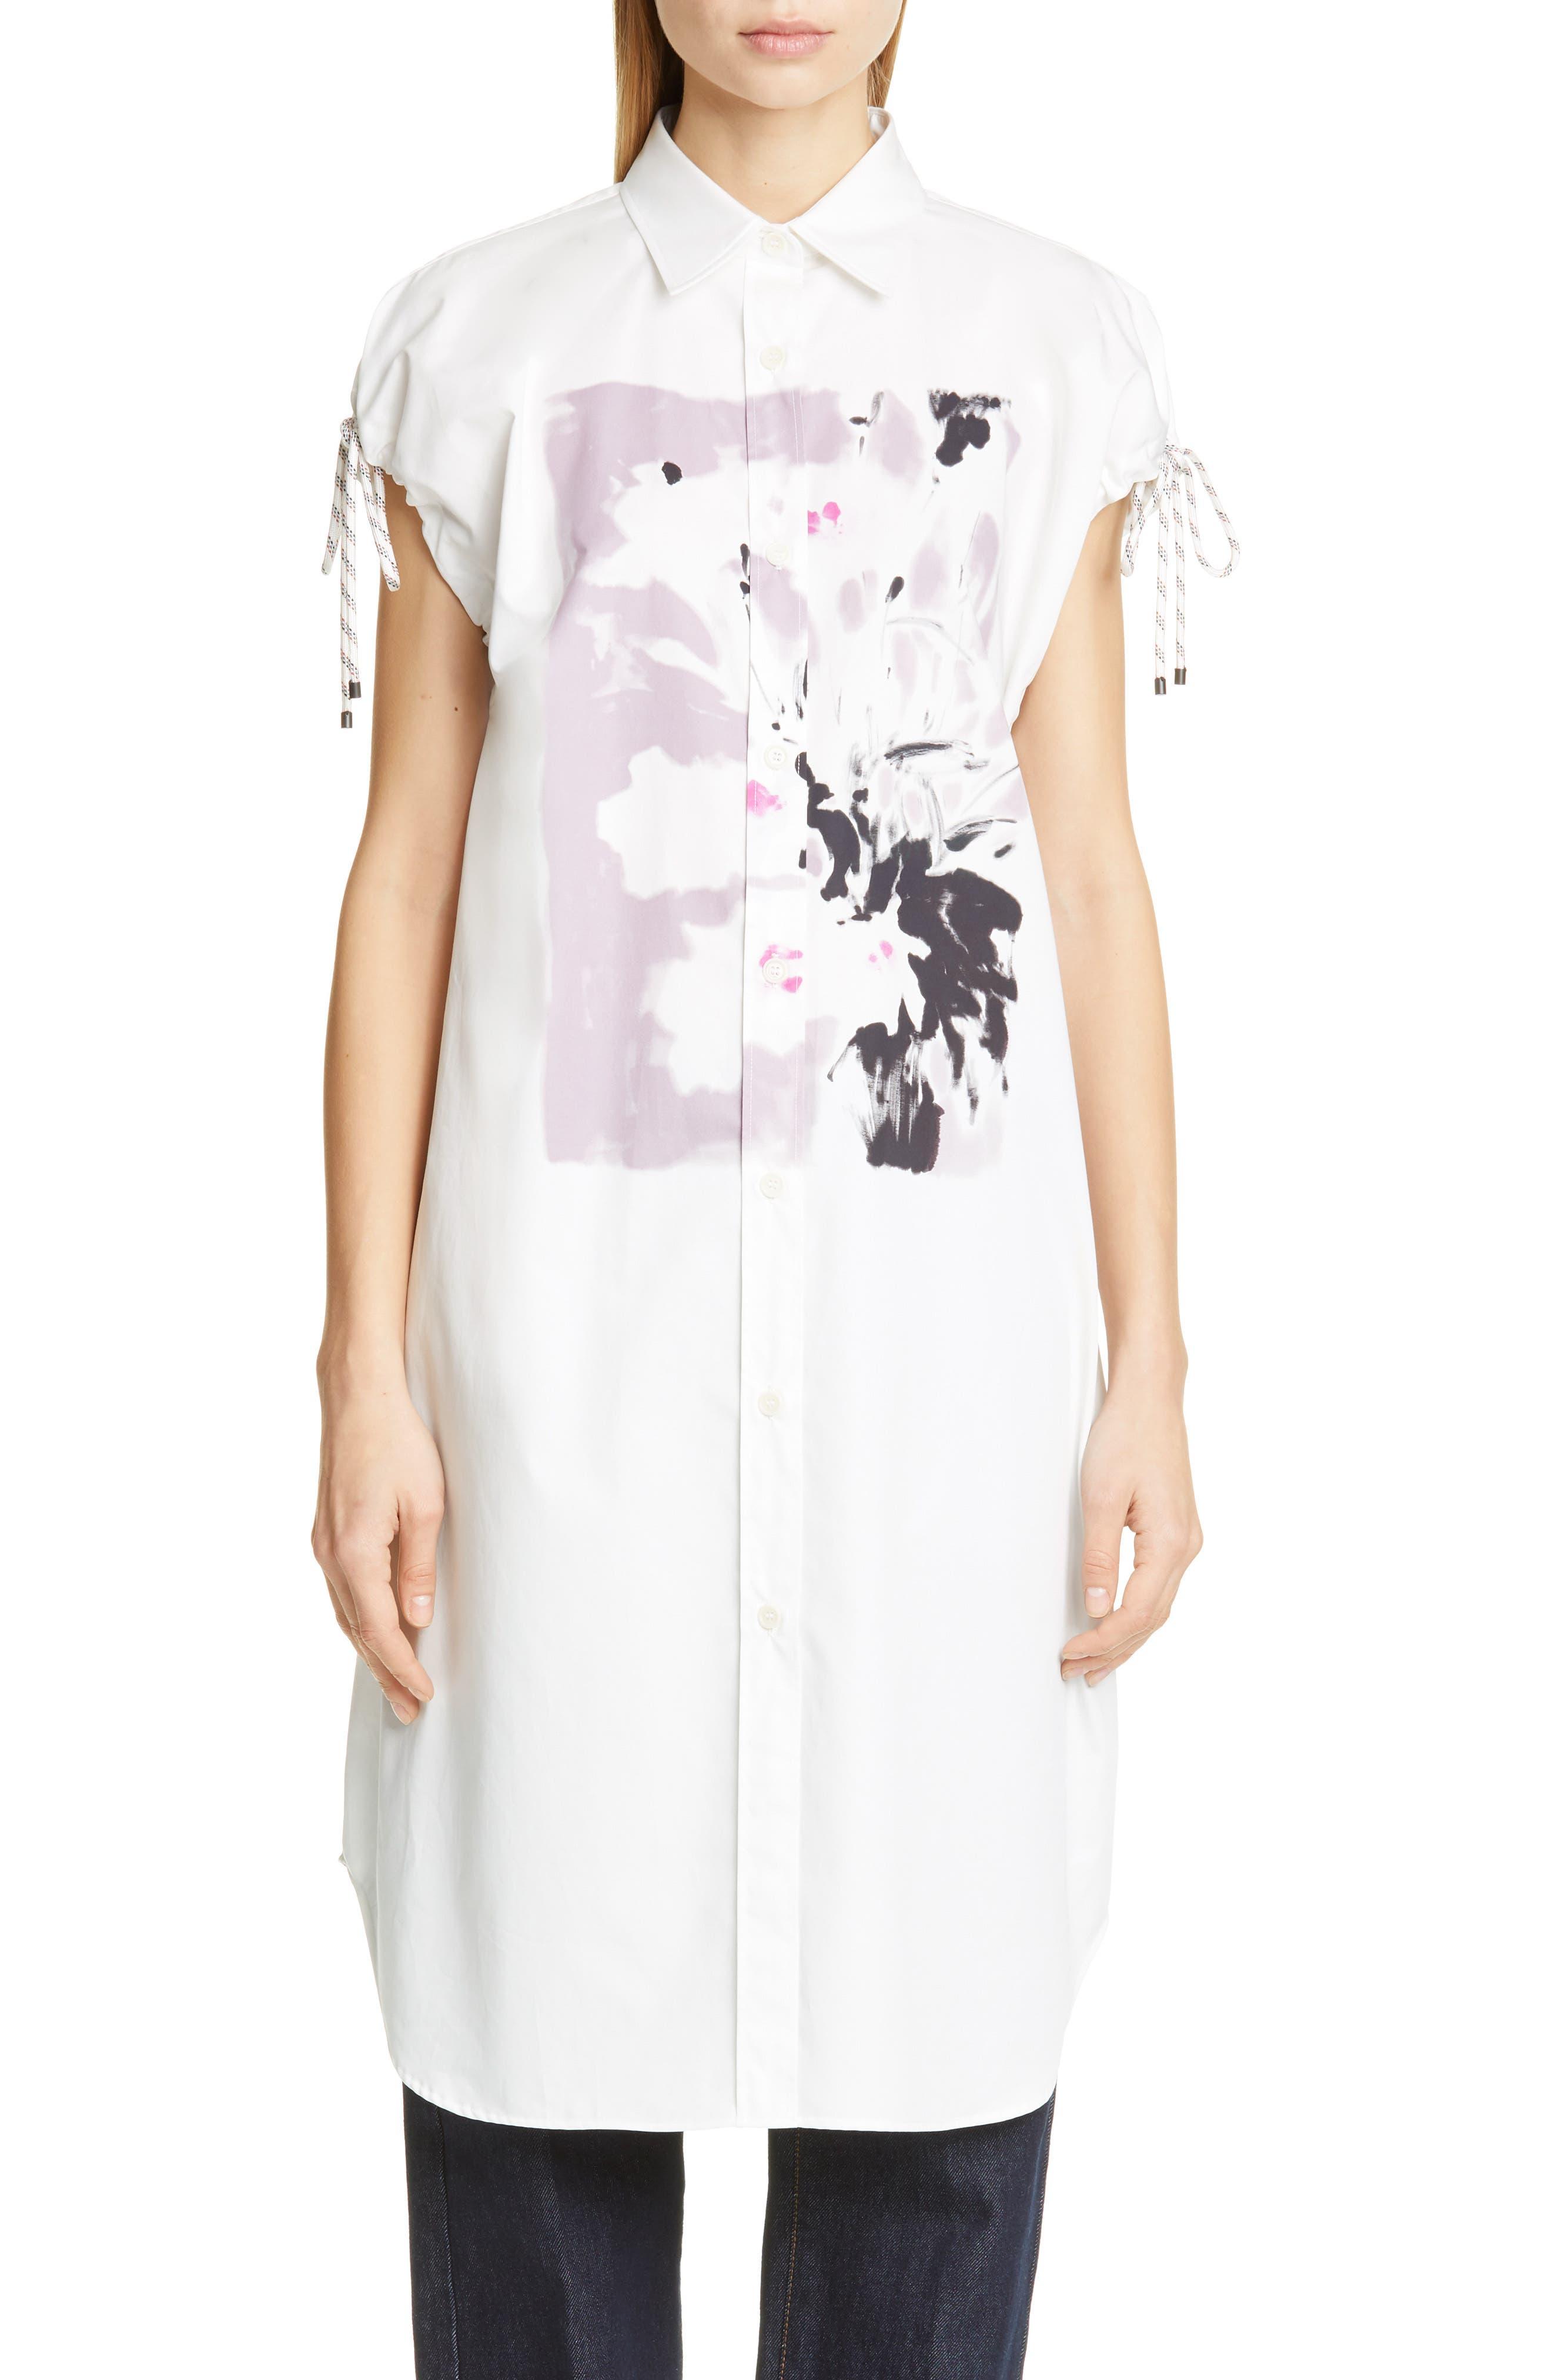 DRIES VAN NOTEN Dantia Floral Print Cotton Shirt, Main, color, LILAC